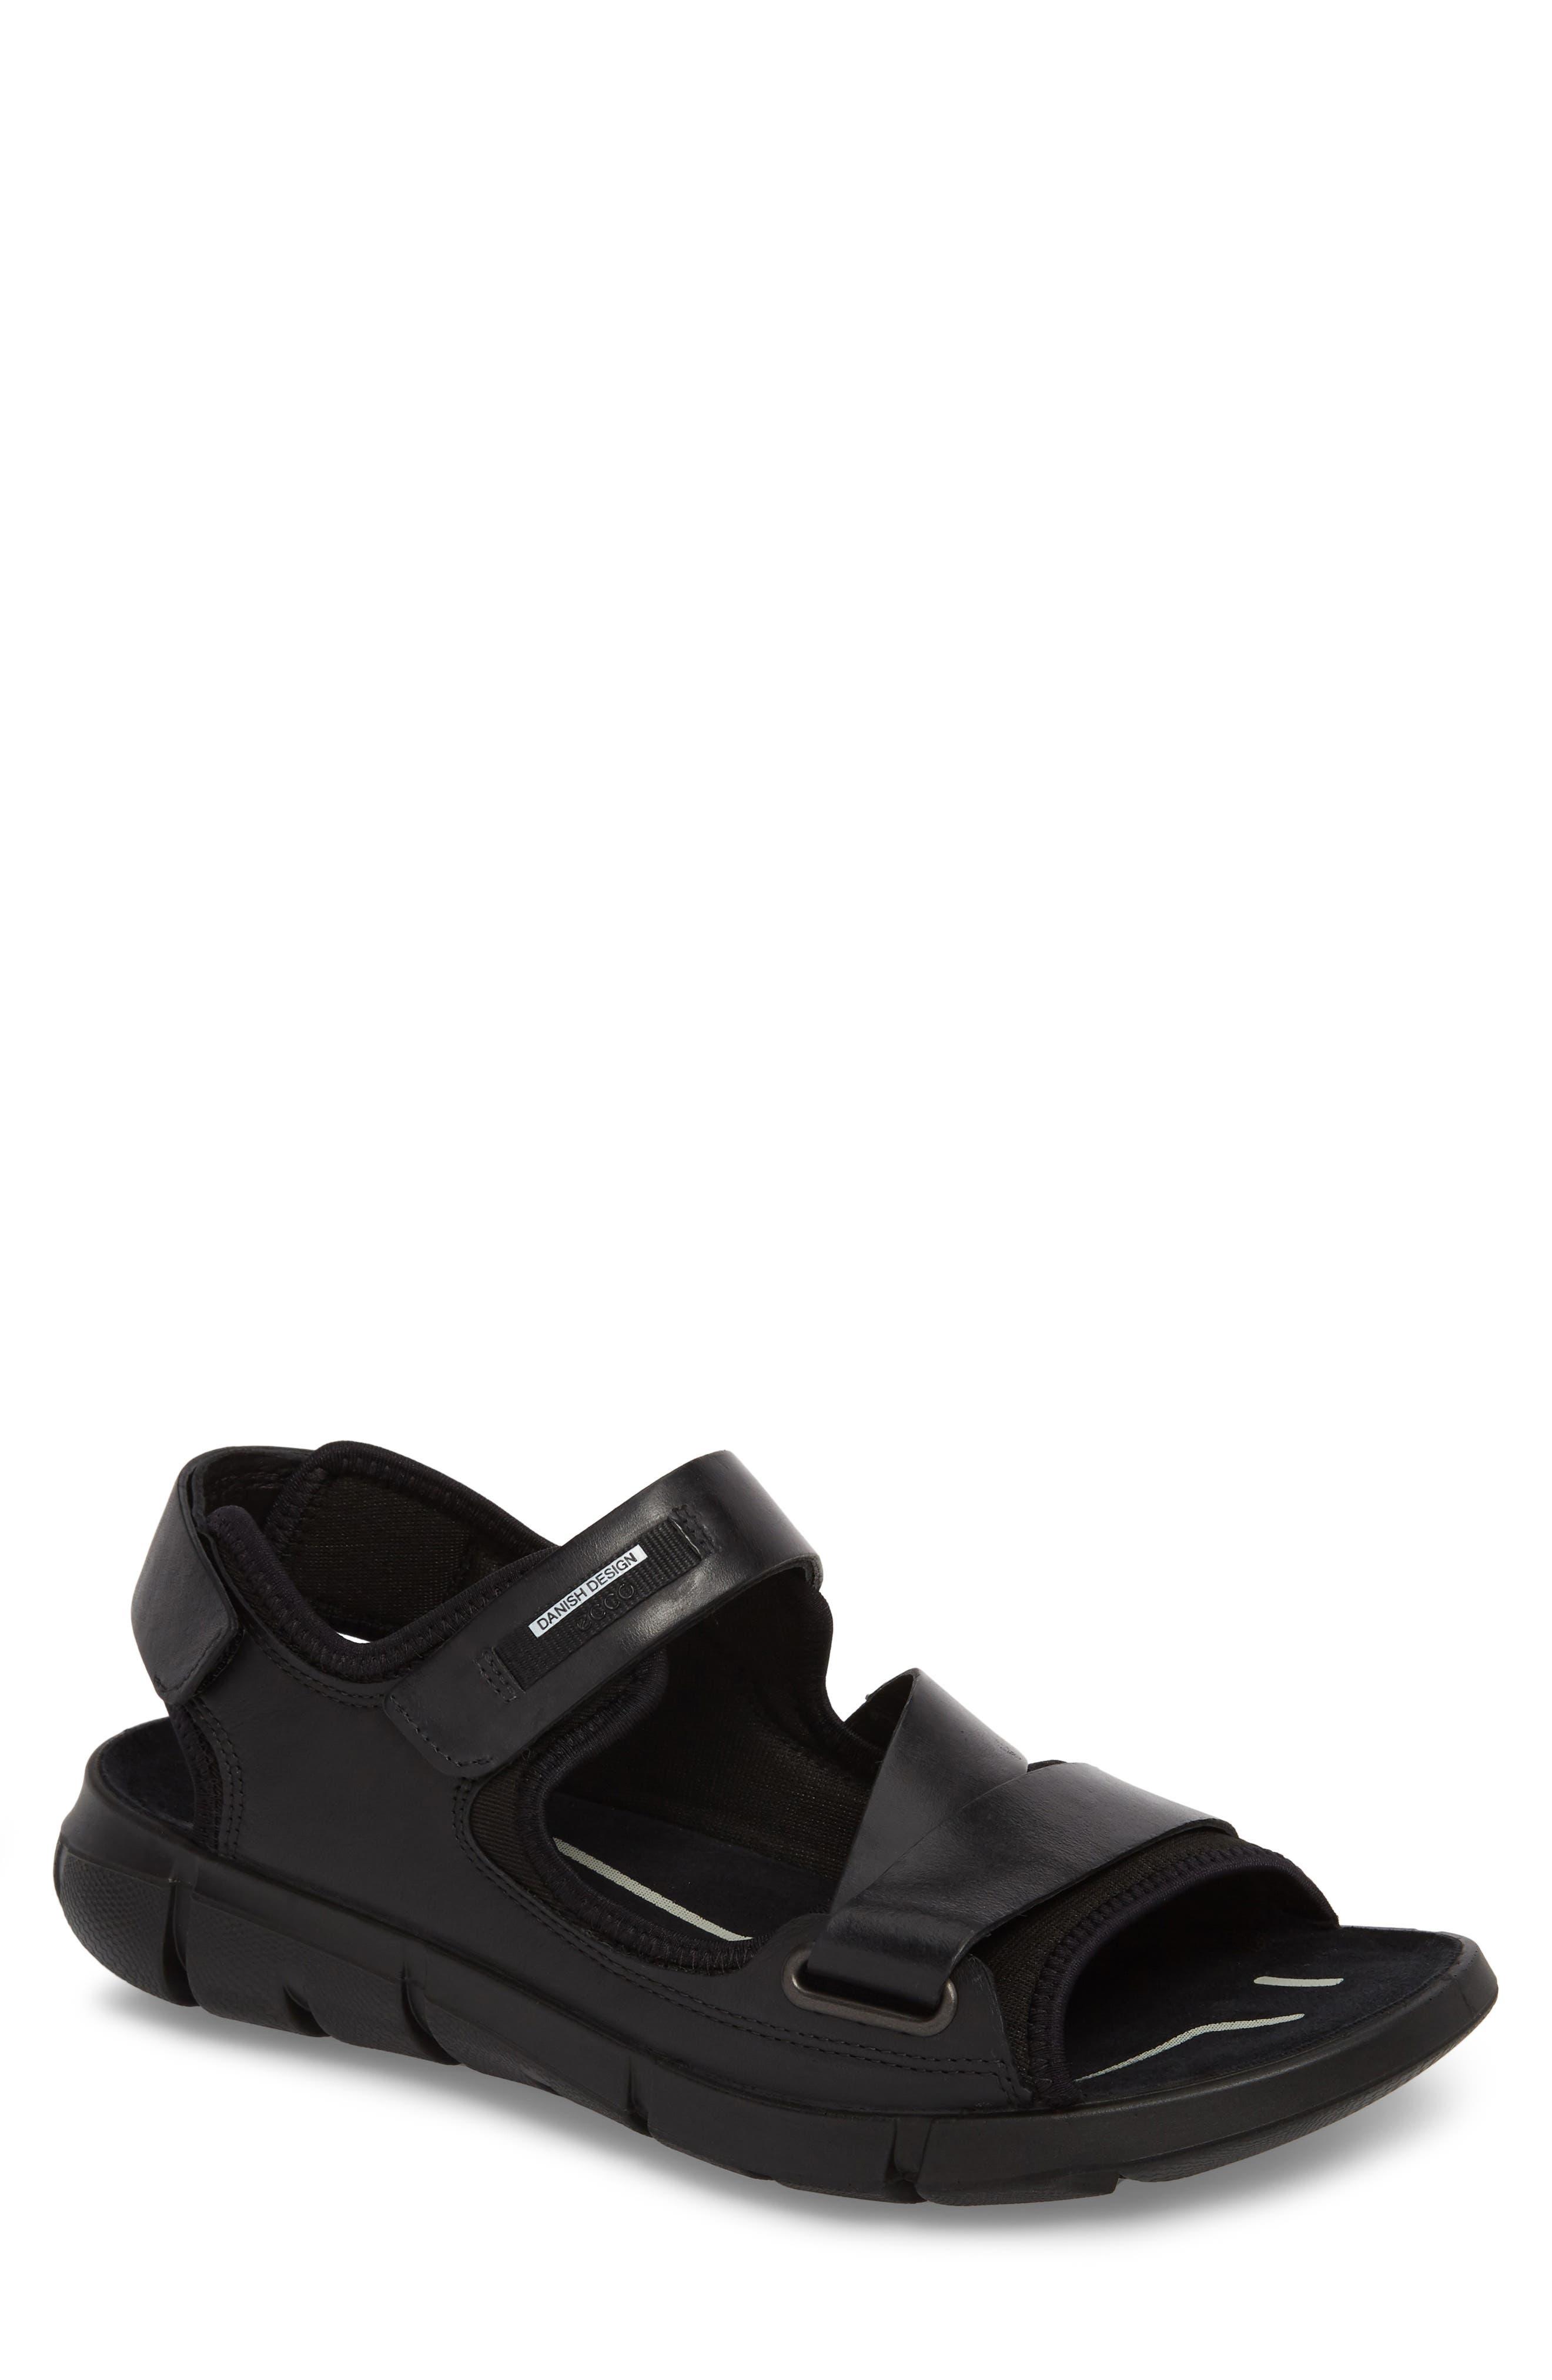 Intrinsic 2 Sandal,                             Main thumbnail 1, color,                             Black Leather